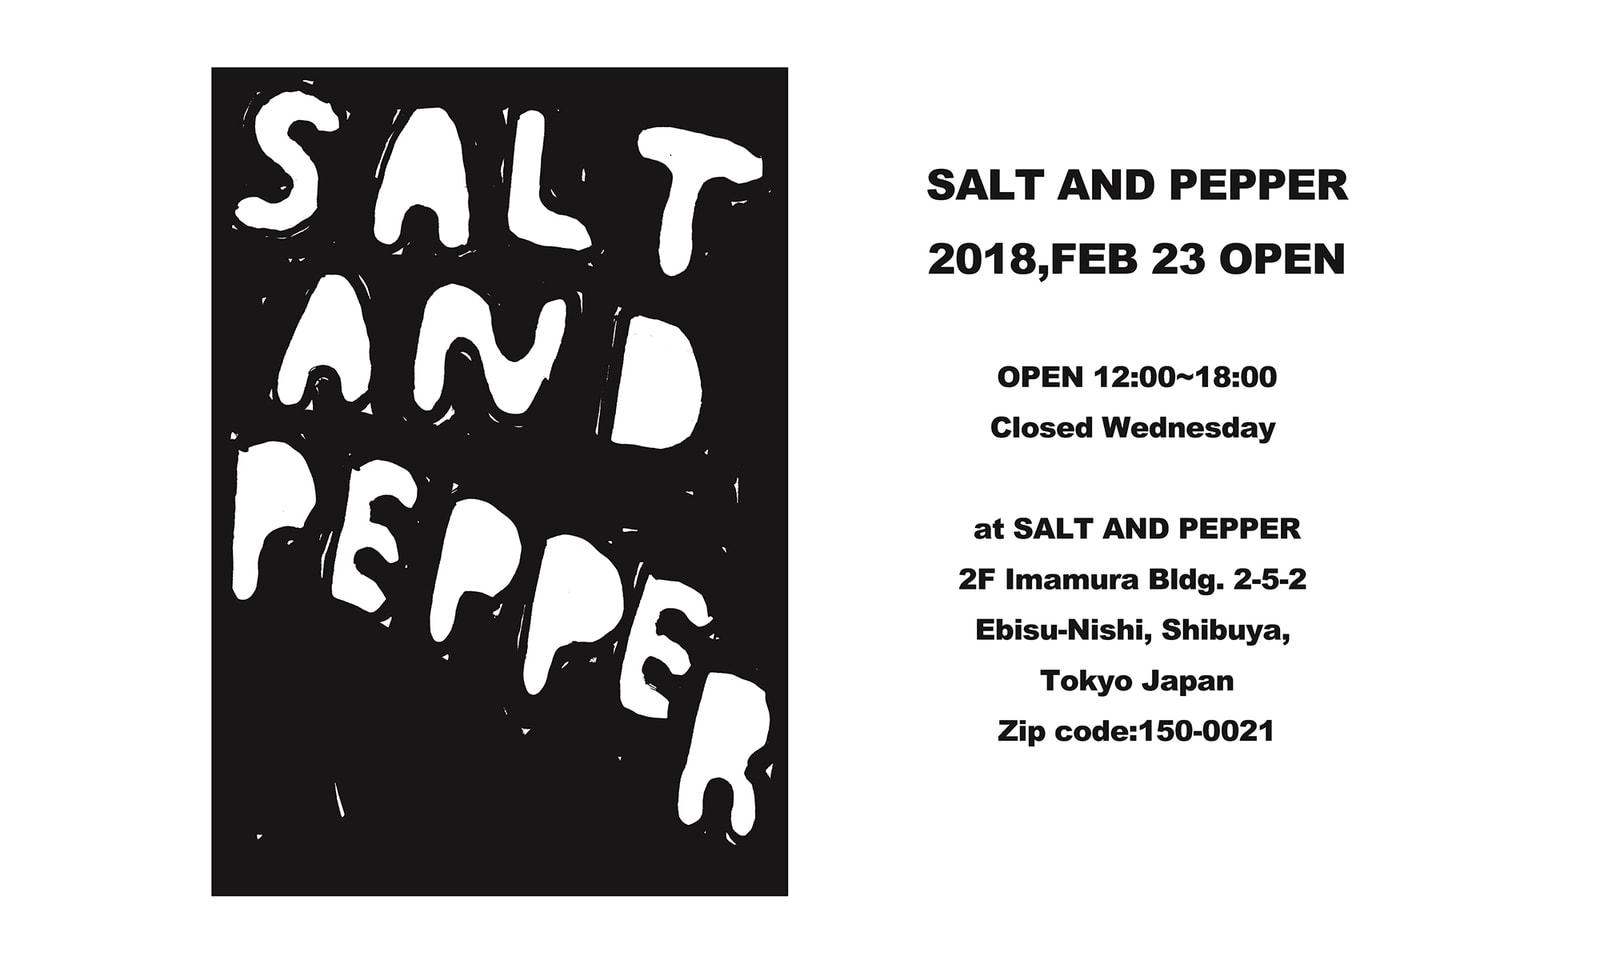 VAINL ARCHIVE がショップ&ギャラリースペース『SALT AND PEPPER』のオープンを発表 HYPEBEAST ハイプビースト ヴァイナル アーカイブ